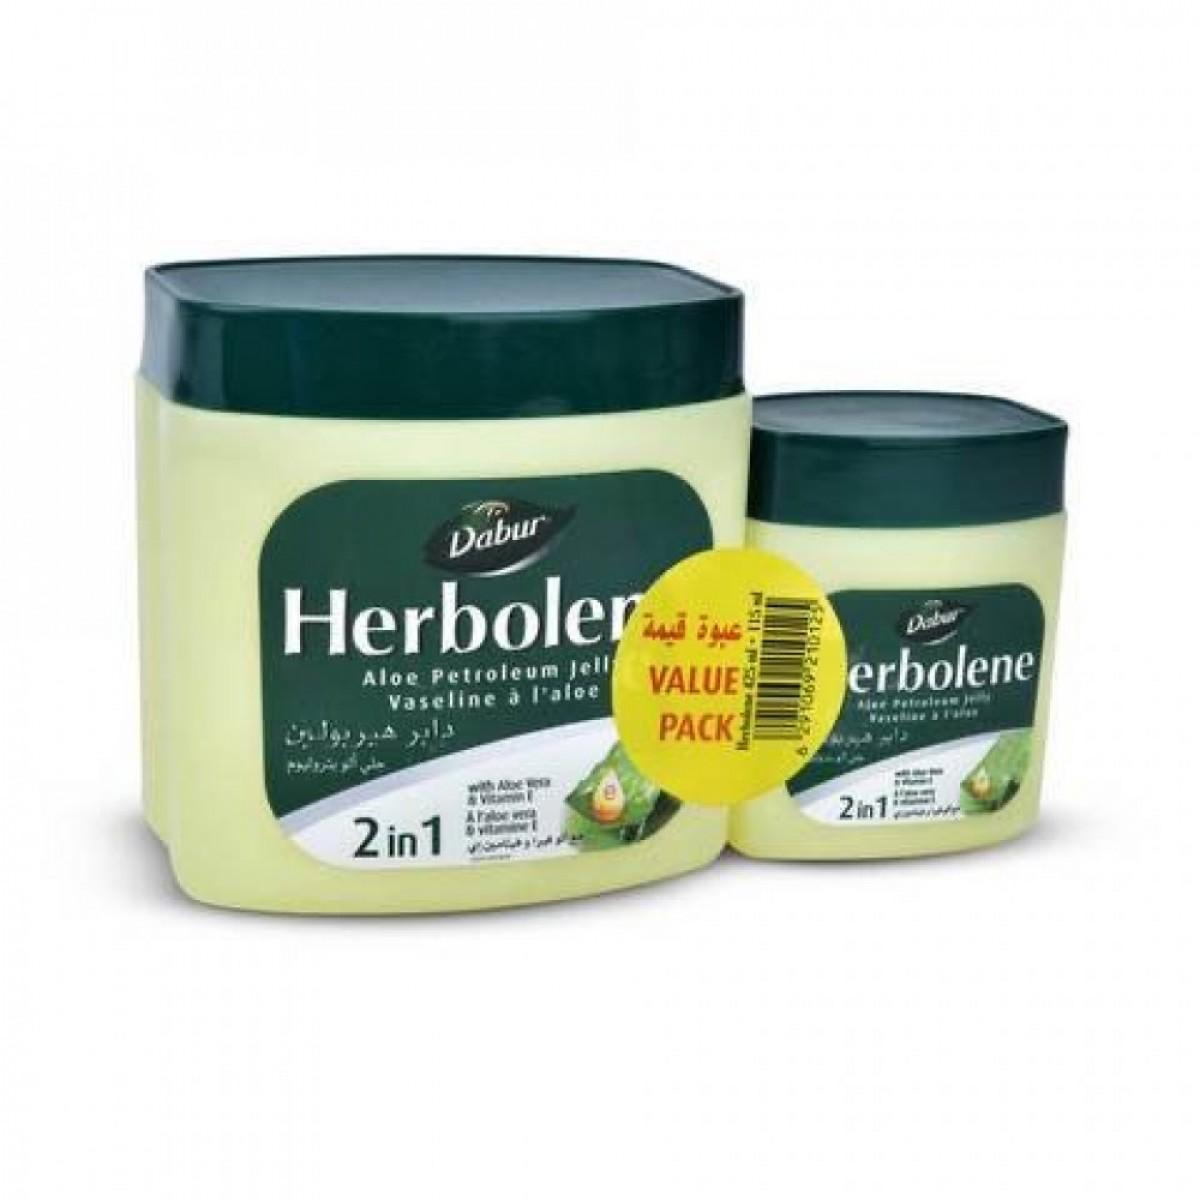 كريم جلي دابر هيربولين  مرطب مع ألو فيرا وفيتامين اي 425 غرام